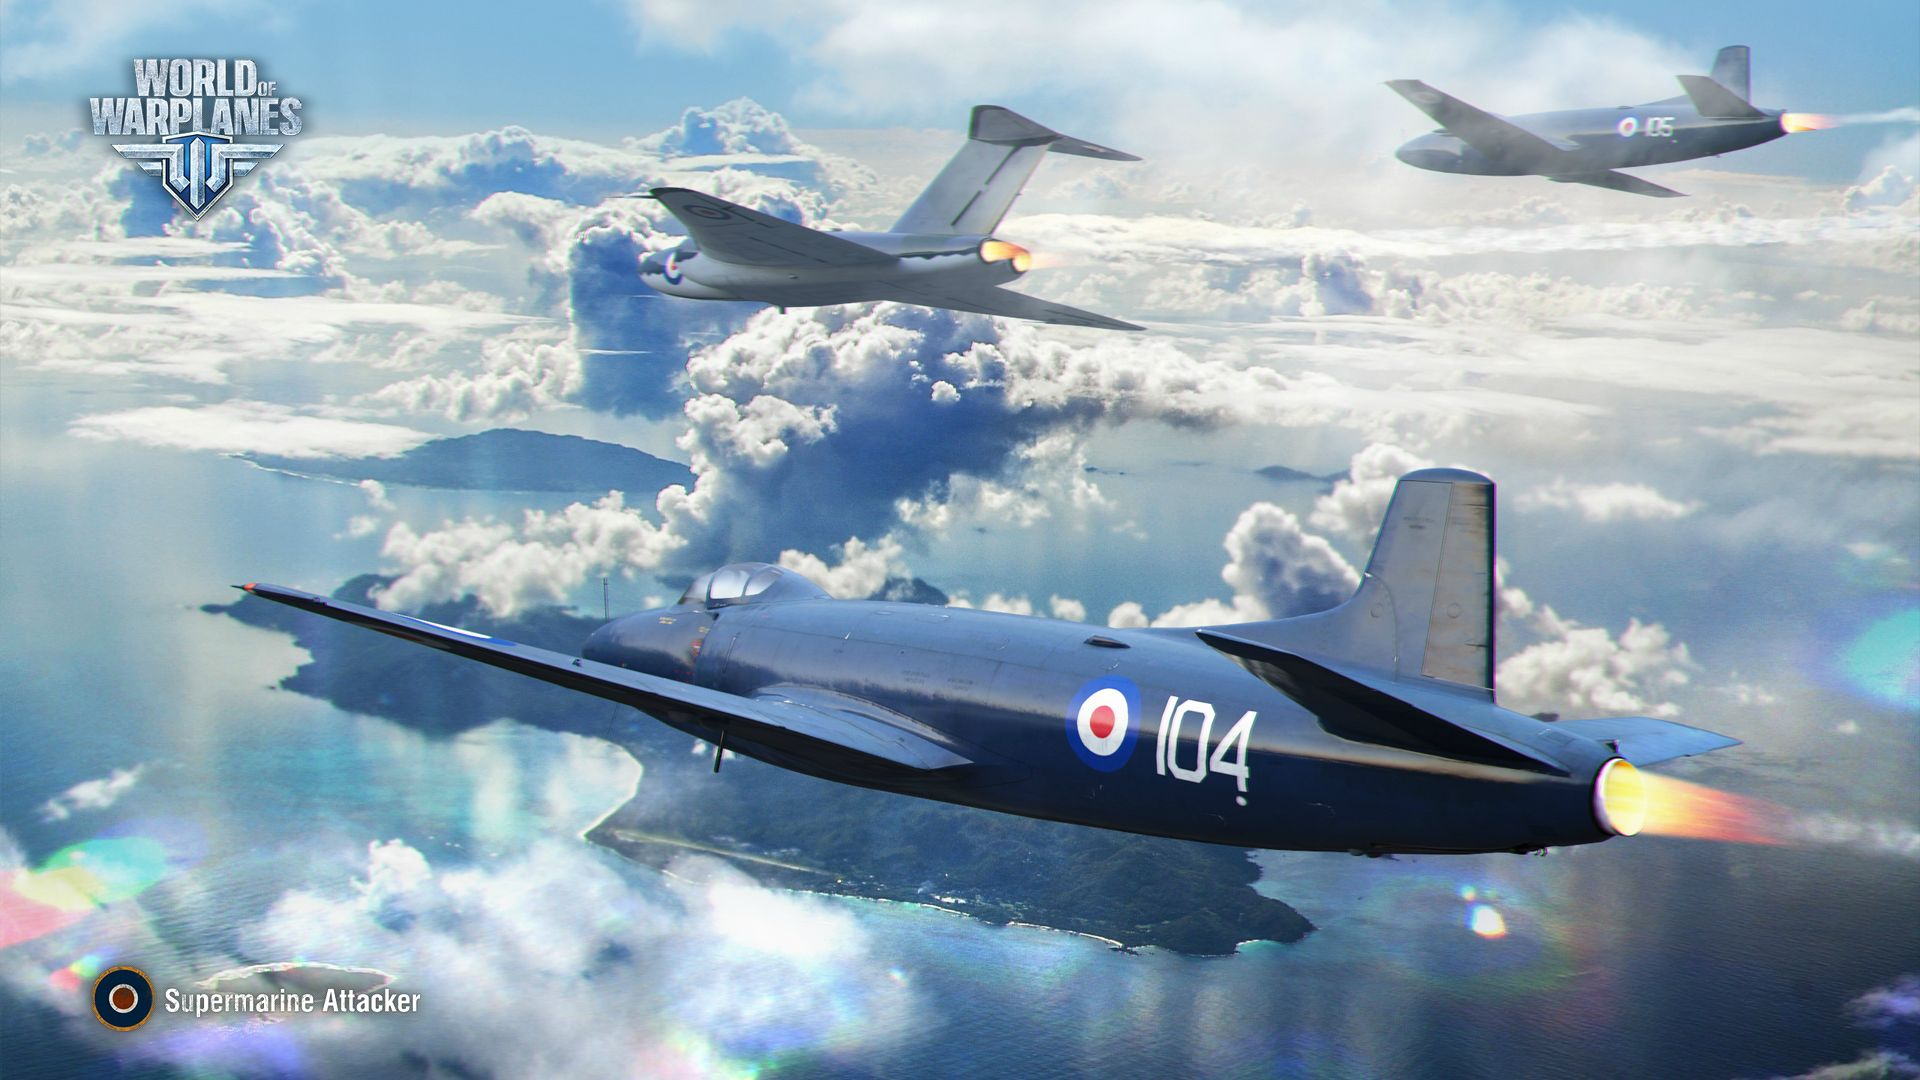 обои World of Warplanes hd